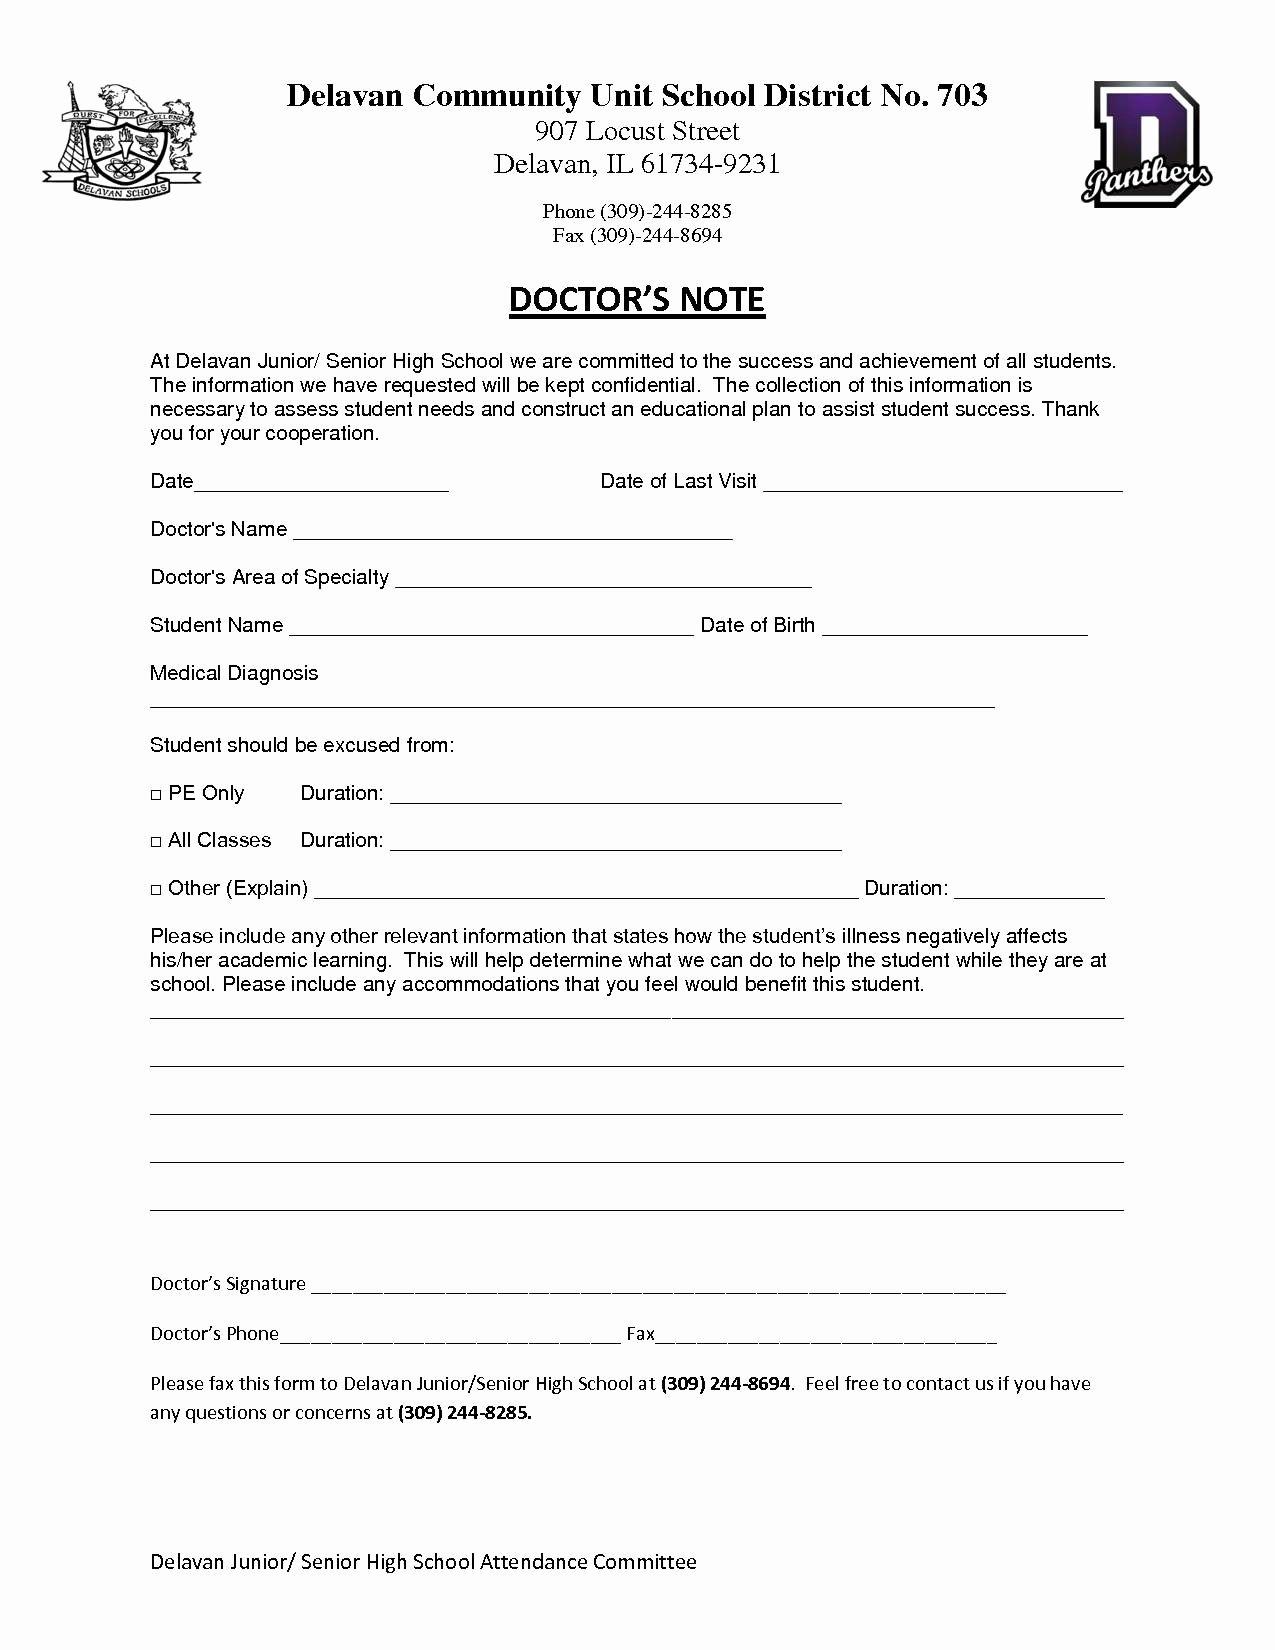 Fake Prescription Pad Template Luxury Prescription Sheet Template Heritage Spreadsheet